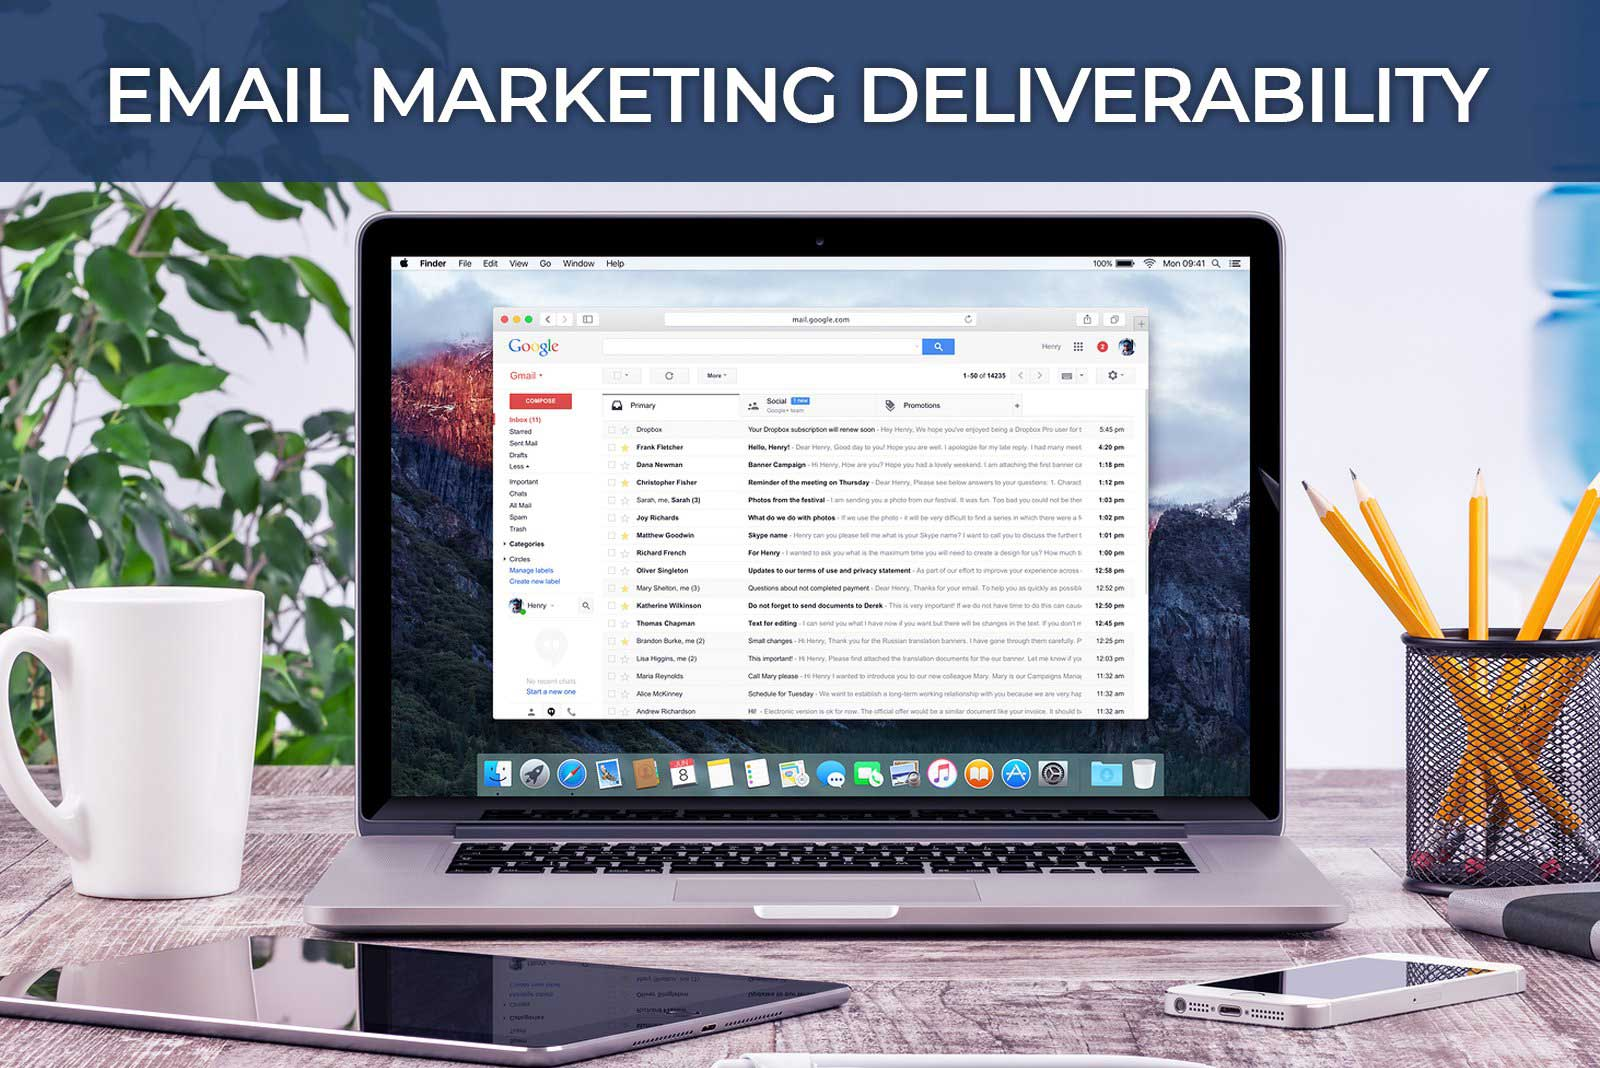 emailmarketingdeliverability2-min-new